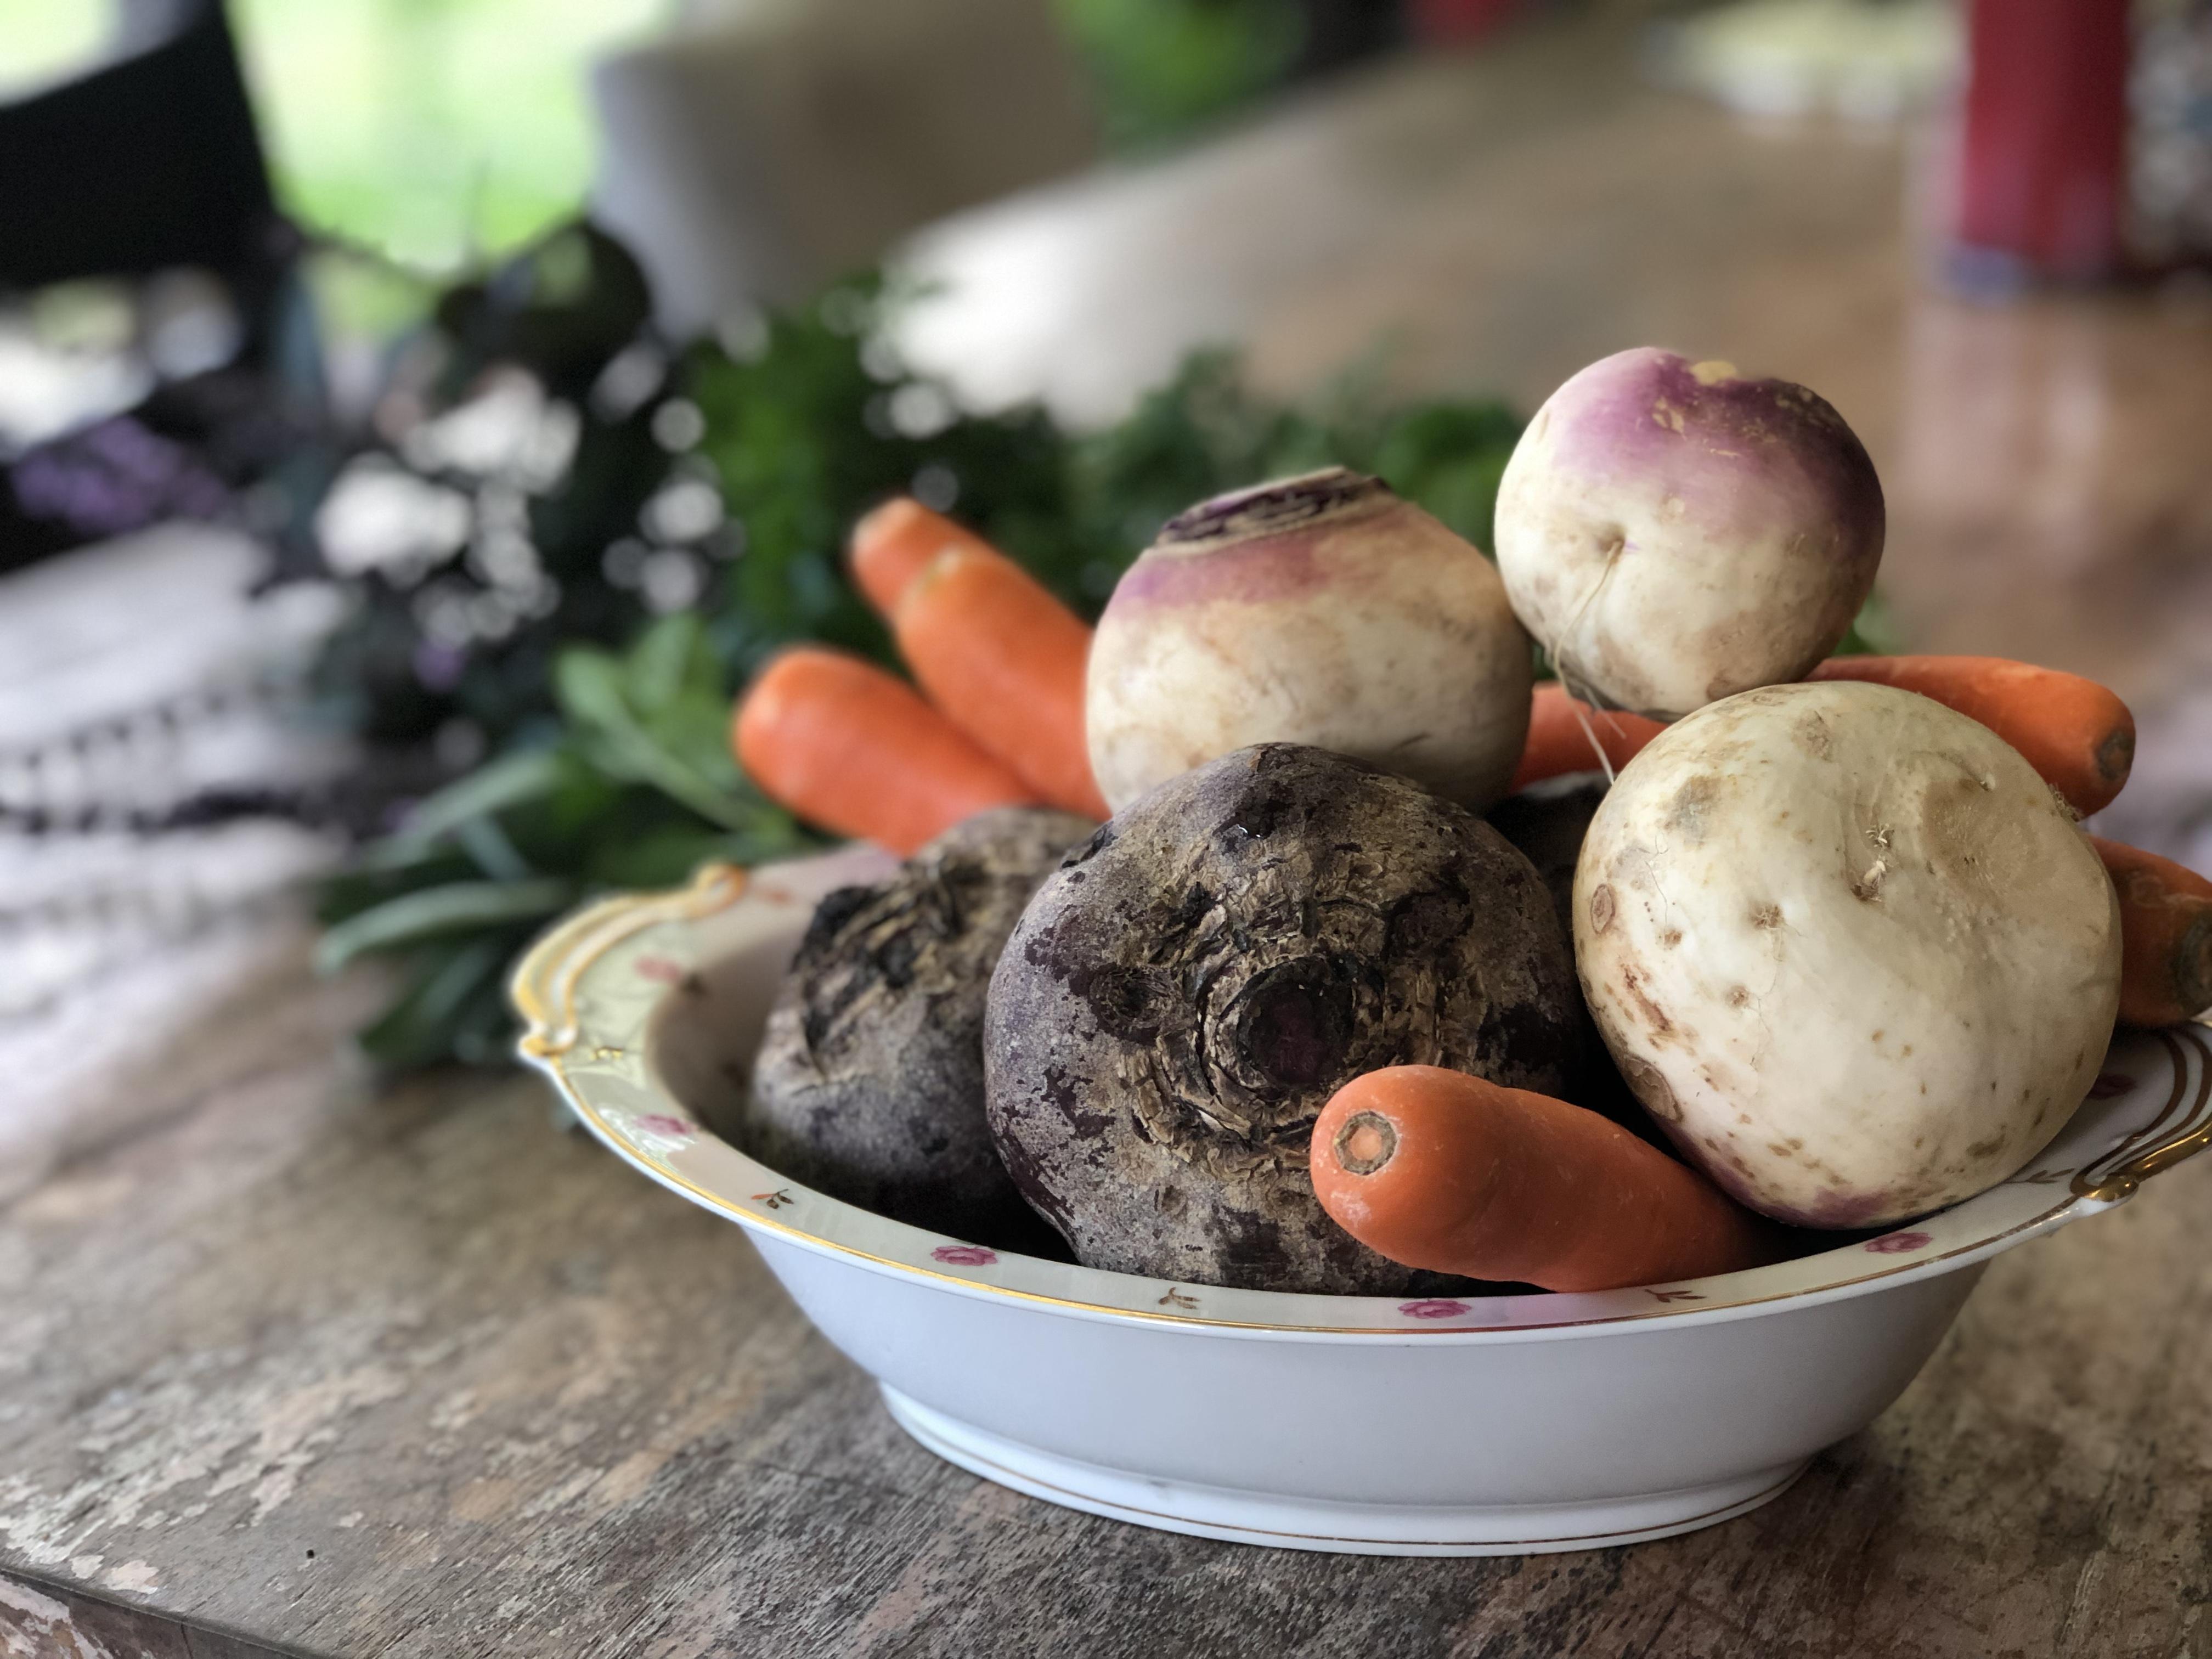 Vegan Potassium Vegetable Broth Organics Love and Co